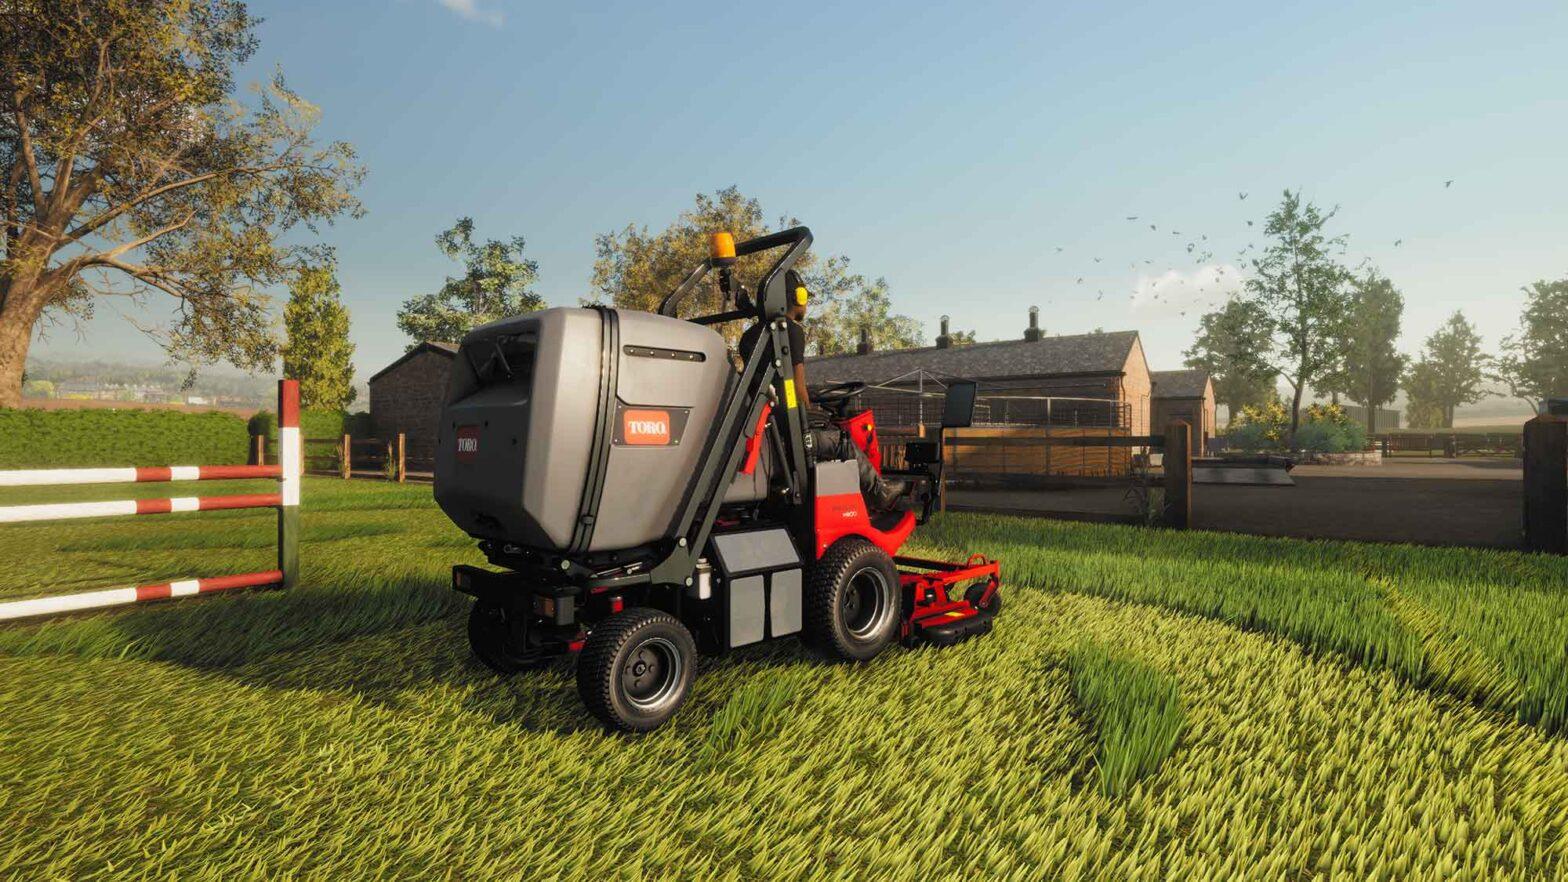 Lawn Mowing Simulator Video Game